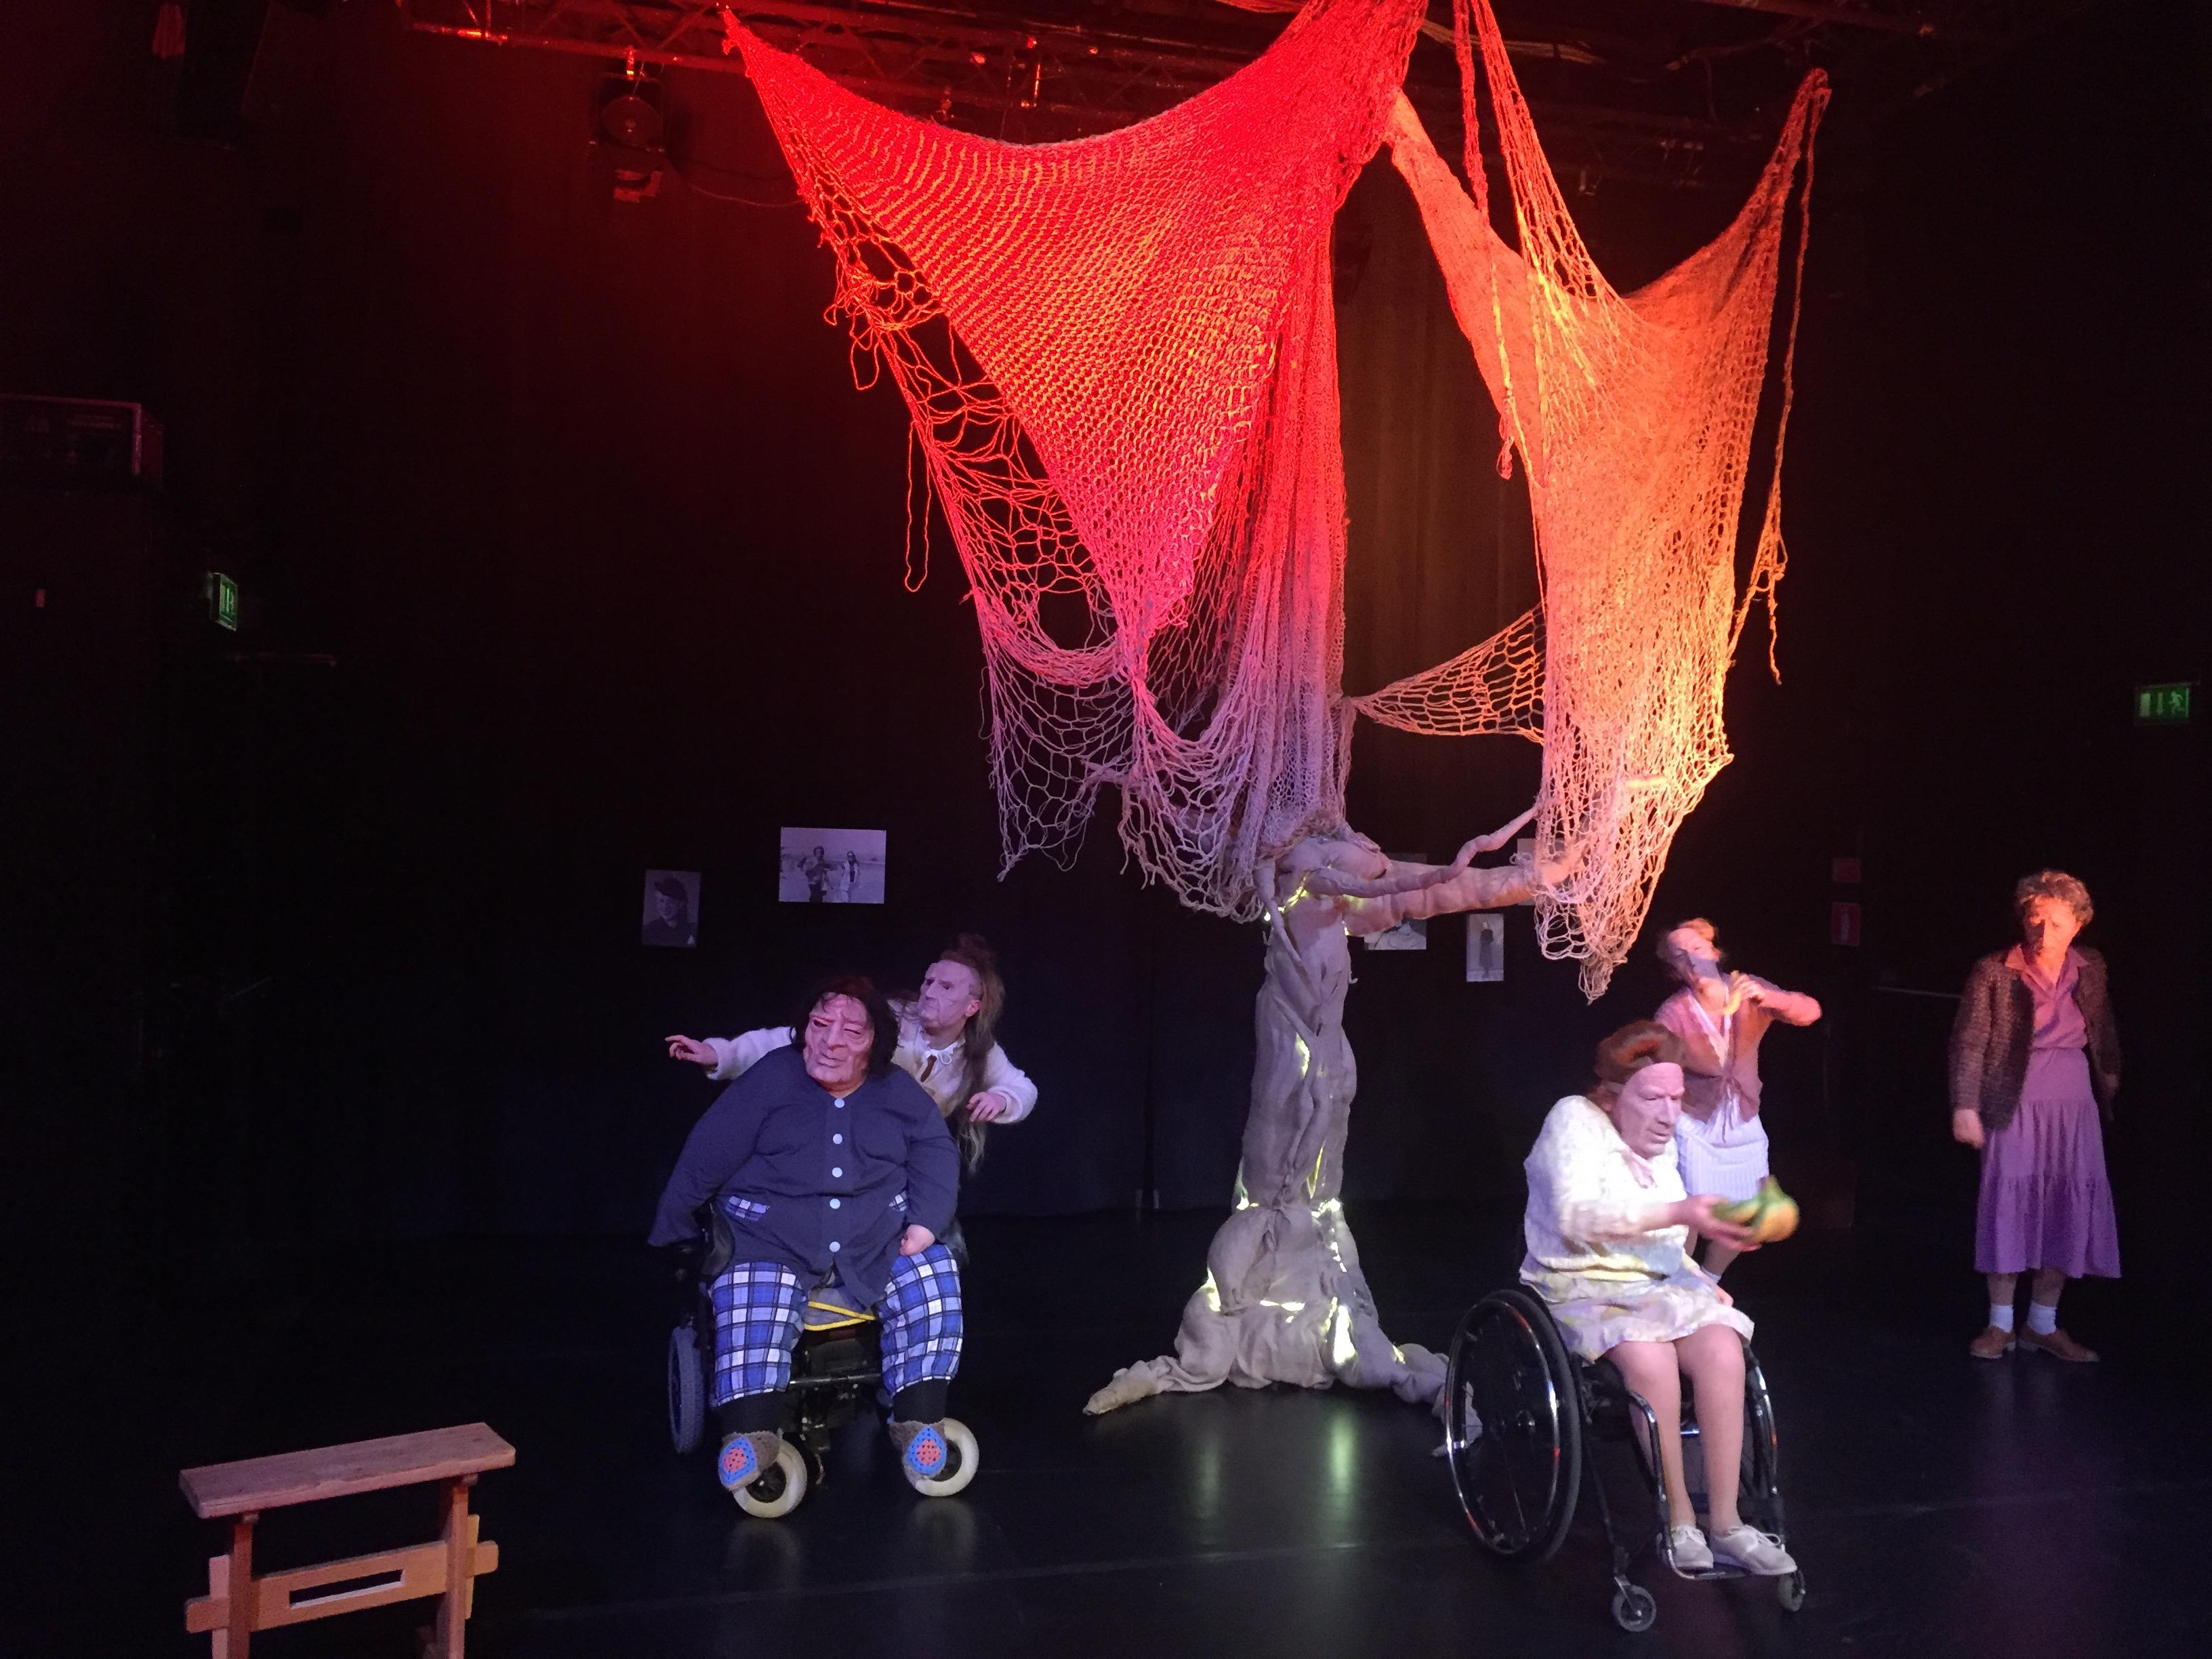 Bild från premiären av Gård av träd på Folkteatern i Göteborg, 10 februari 2017. Foto: Dag Rosenqvist